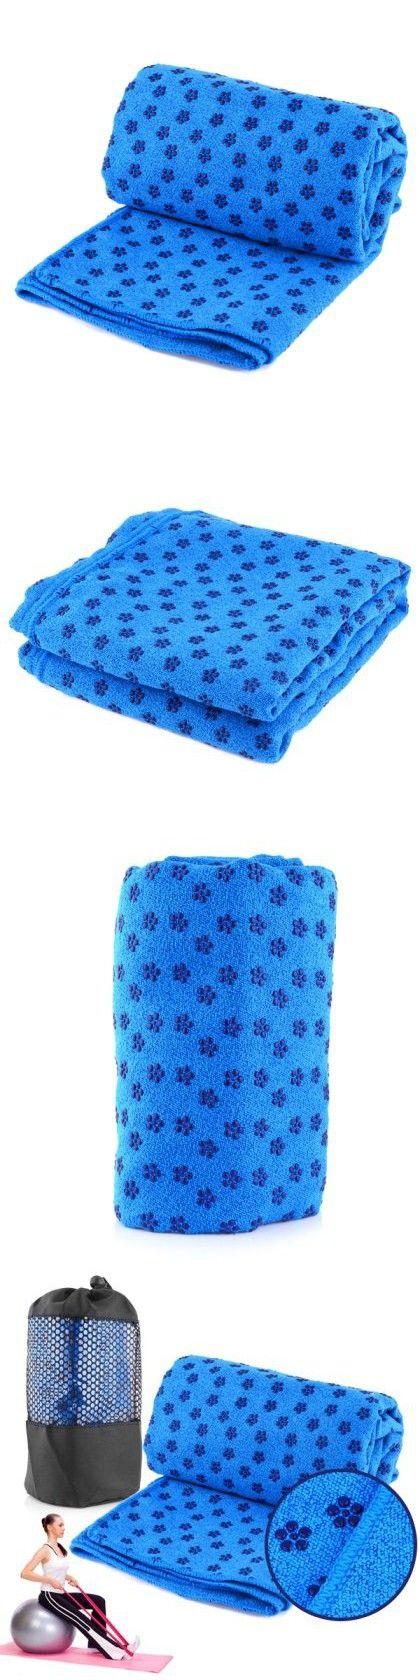 Kisstaker Superior Microfiber Anti Slip Yoga Mat Towels Blue